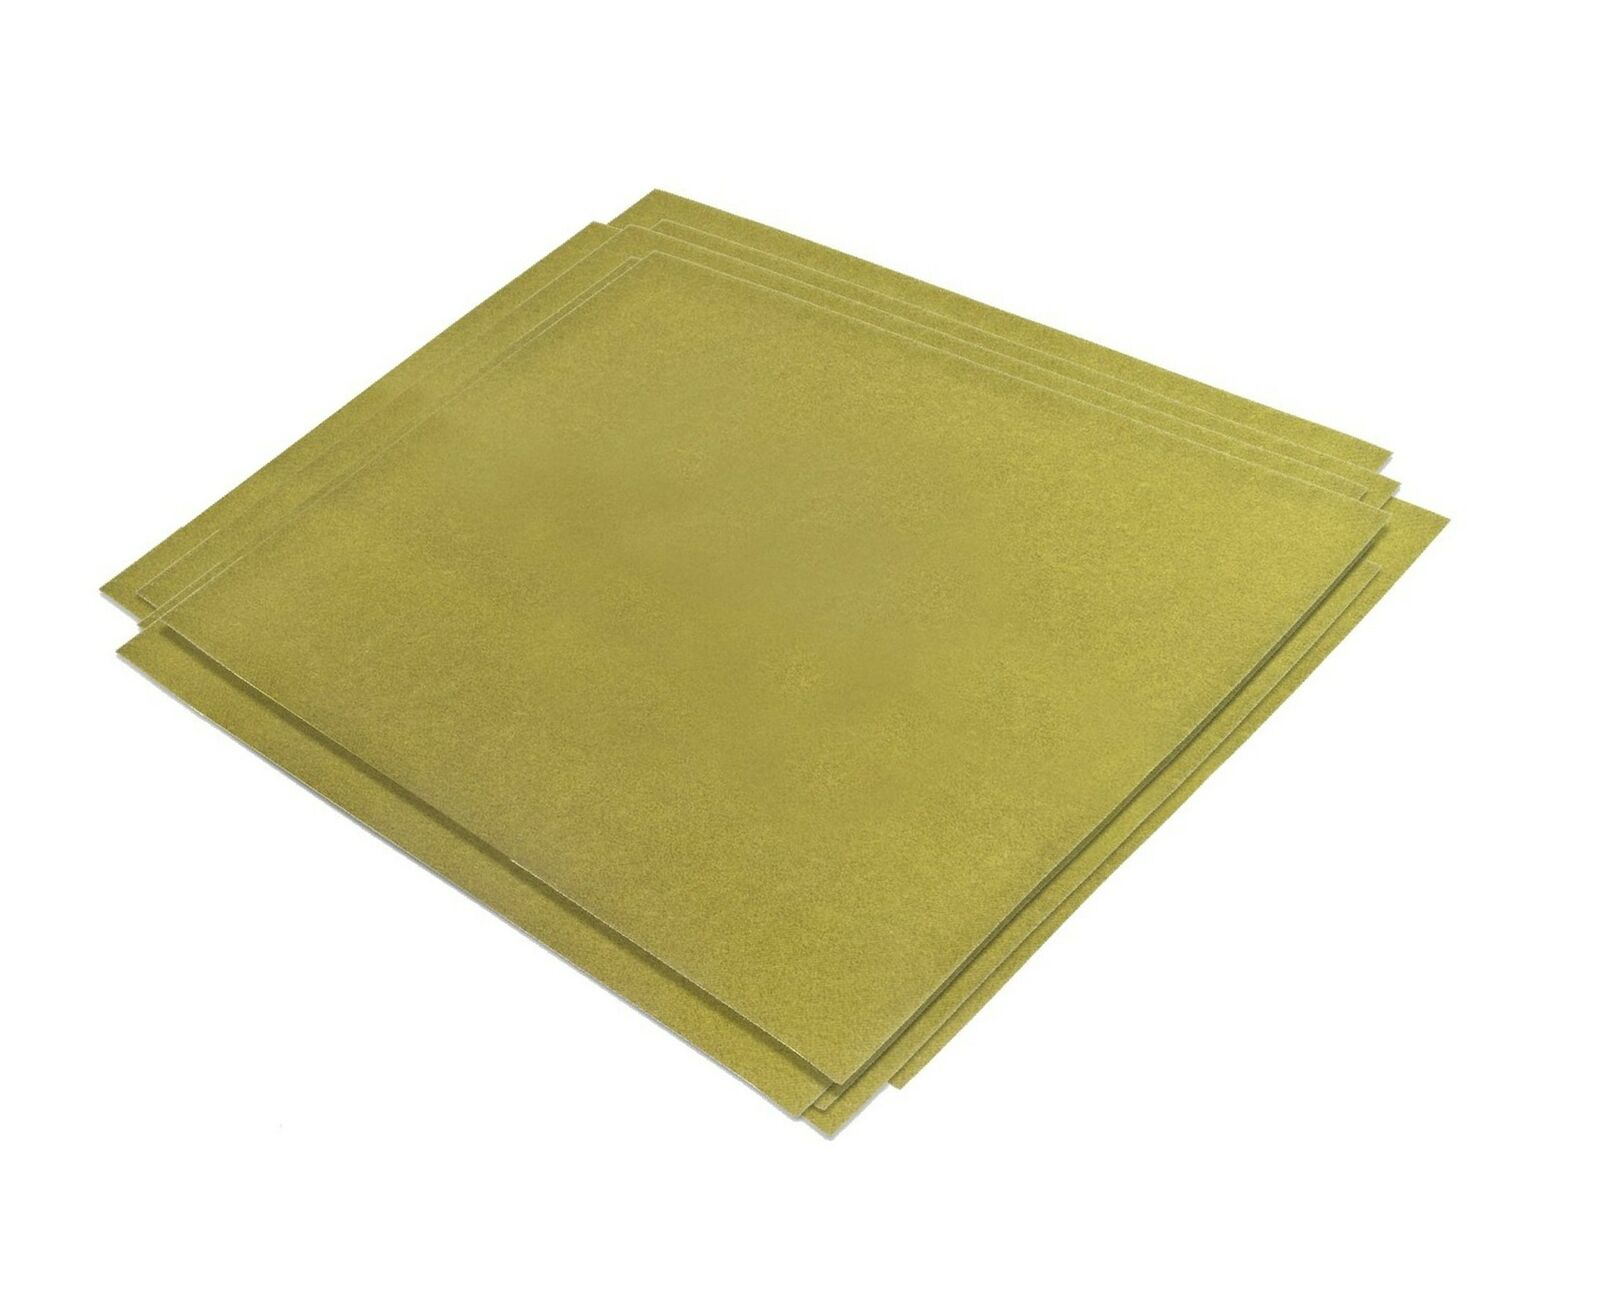 9 8-1/2-Inch X 11-Inch 3 2 Zona 37-948 3M Wet/Dry Polishing Paper ...